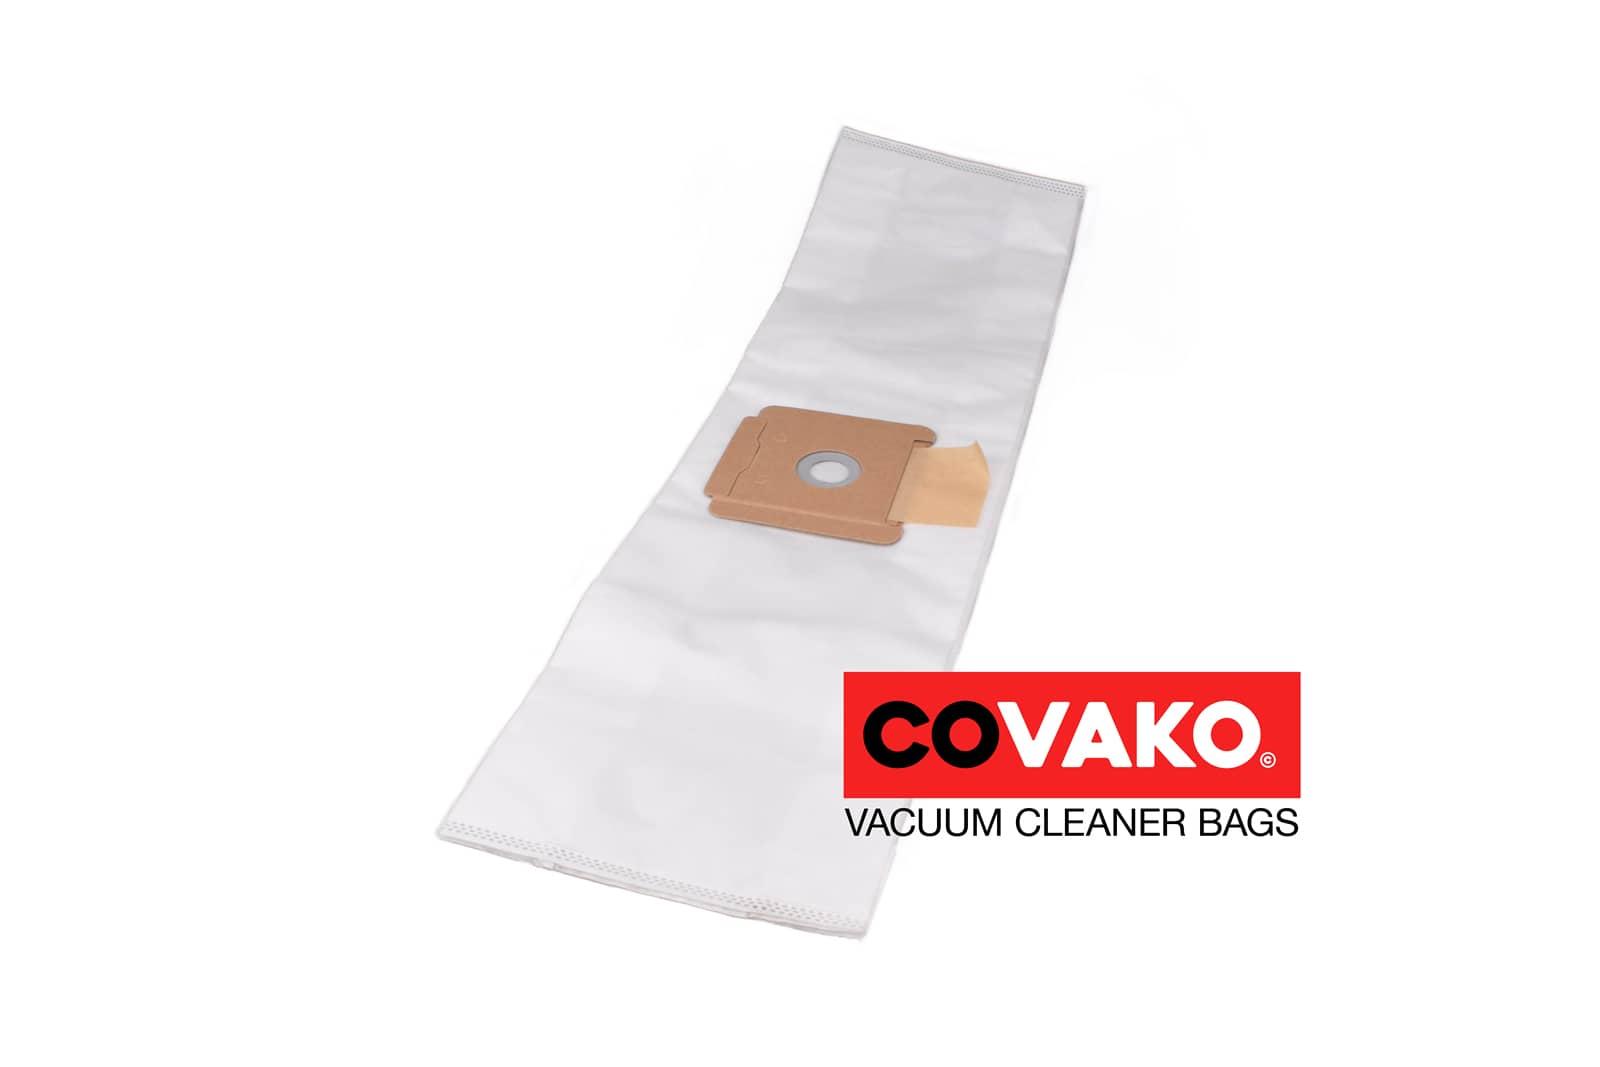 Hawig TS 6 / Synthétique - Hawig sacs d'aspirateur